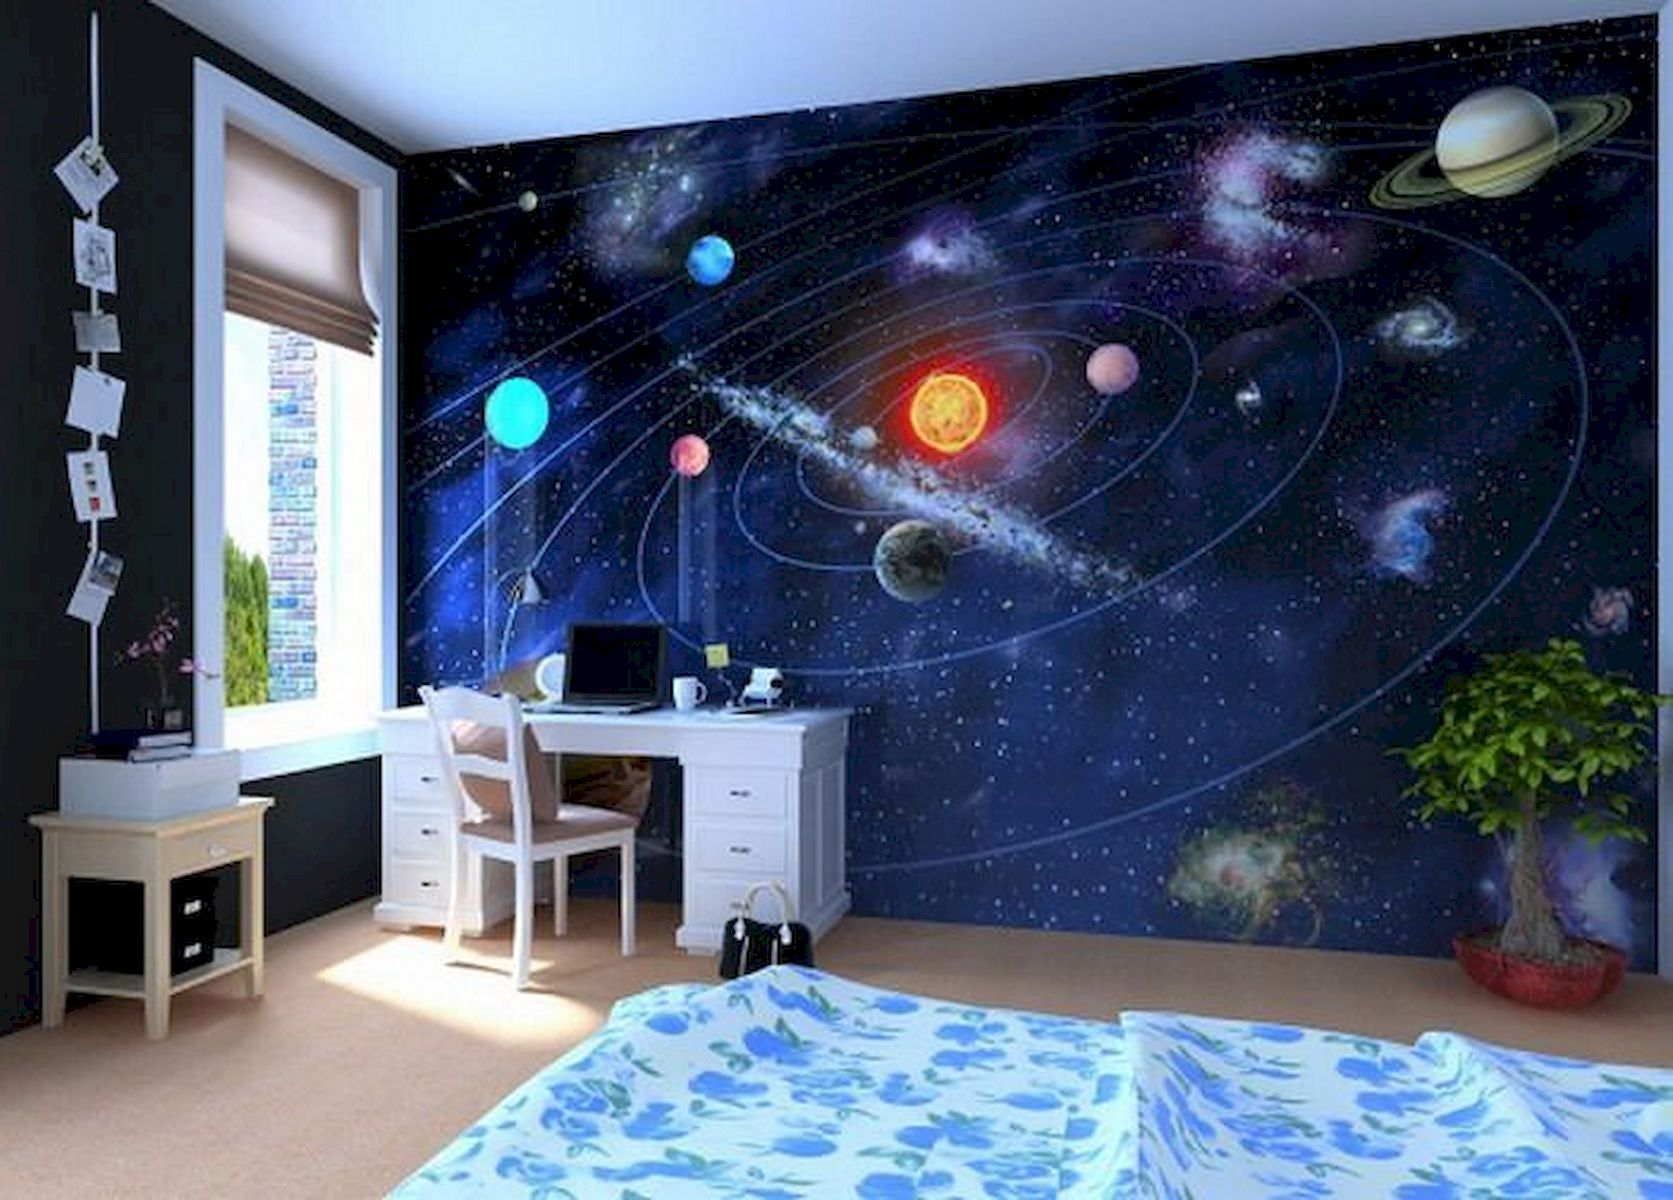 10 Home Paint Design For Kids Inspiration Develop Smarter Little Creativity Freshouz Com Outer Space Bedroom Outer Space Bedroom Decor Space Themed Bedroom